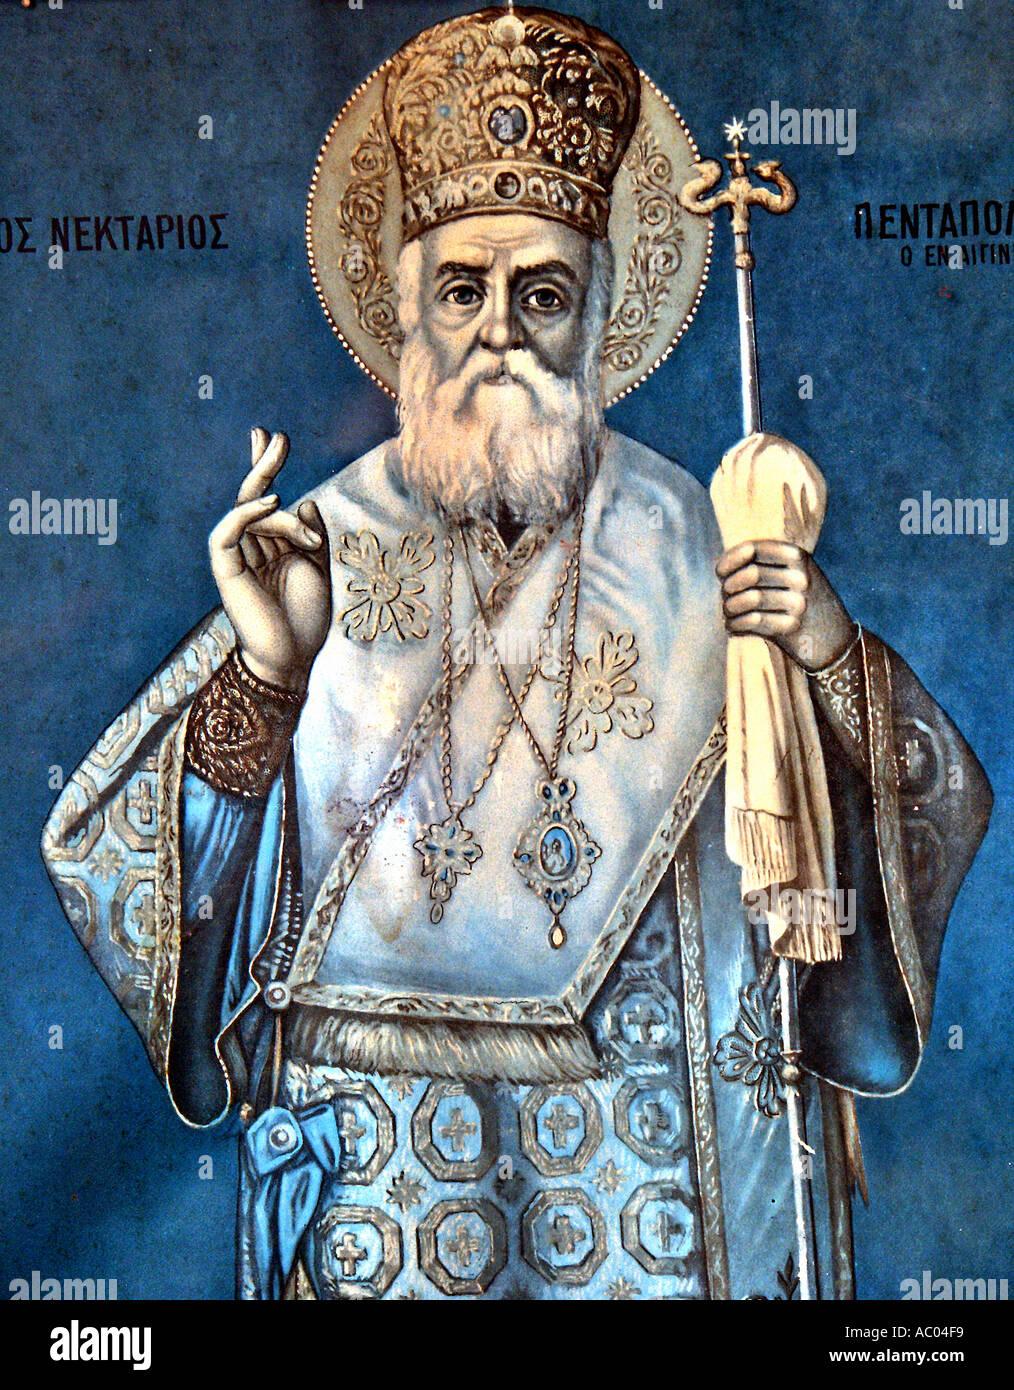 Agios Nektarios Pendapolotis Saint Hagios illustration ancienne église des sentiers à Tissiniva Crète Grèce île Photo Stock